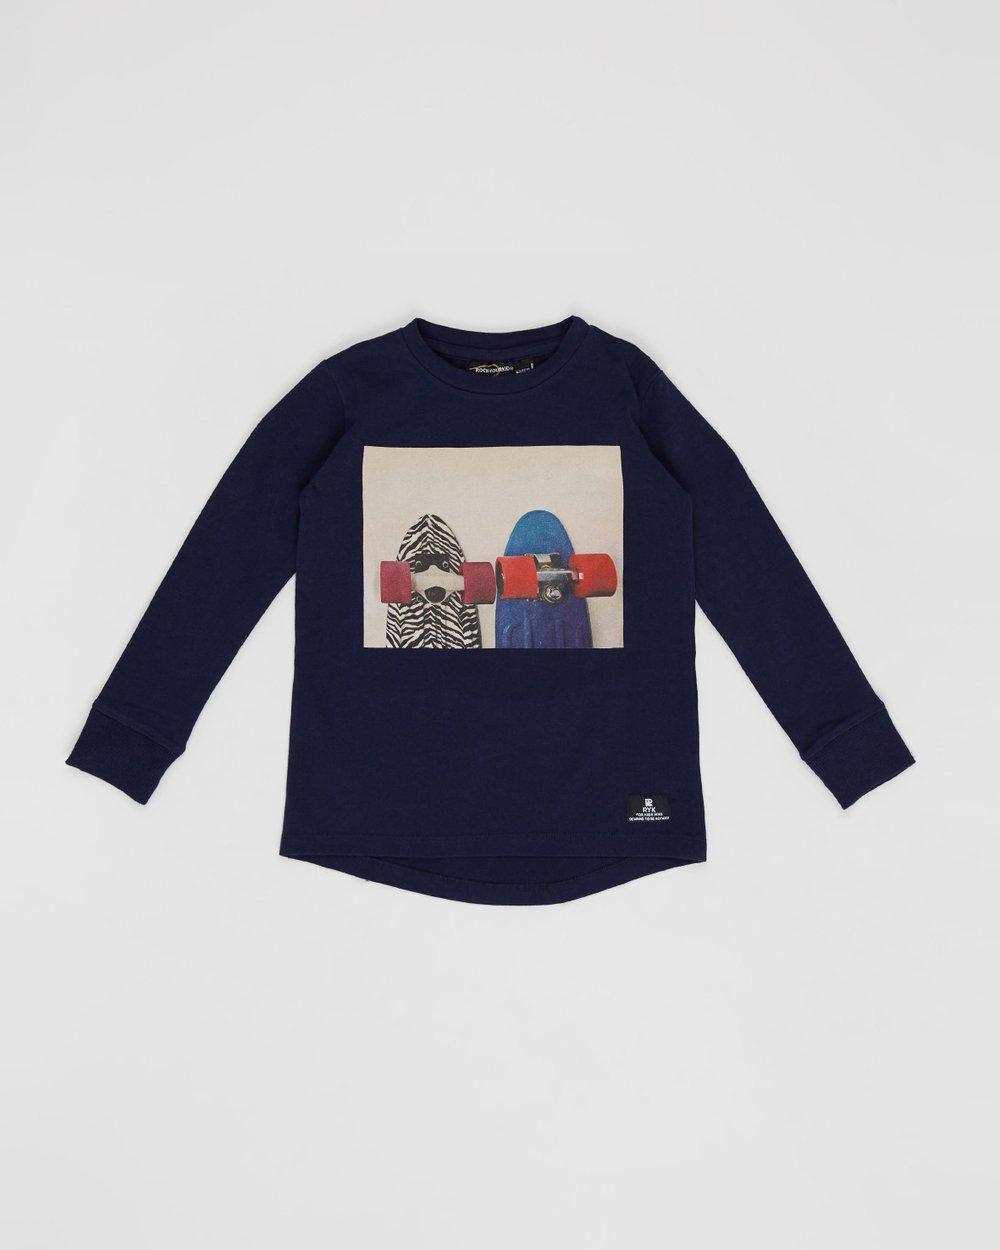 7e8ce3da Today We Ride Long Sleeve T-Shirt - Kids